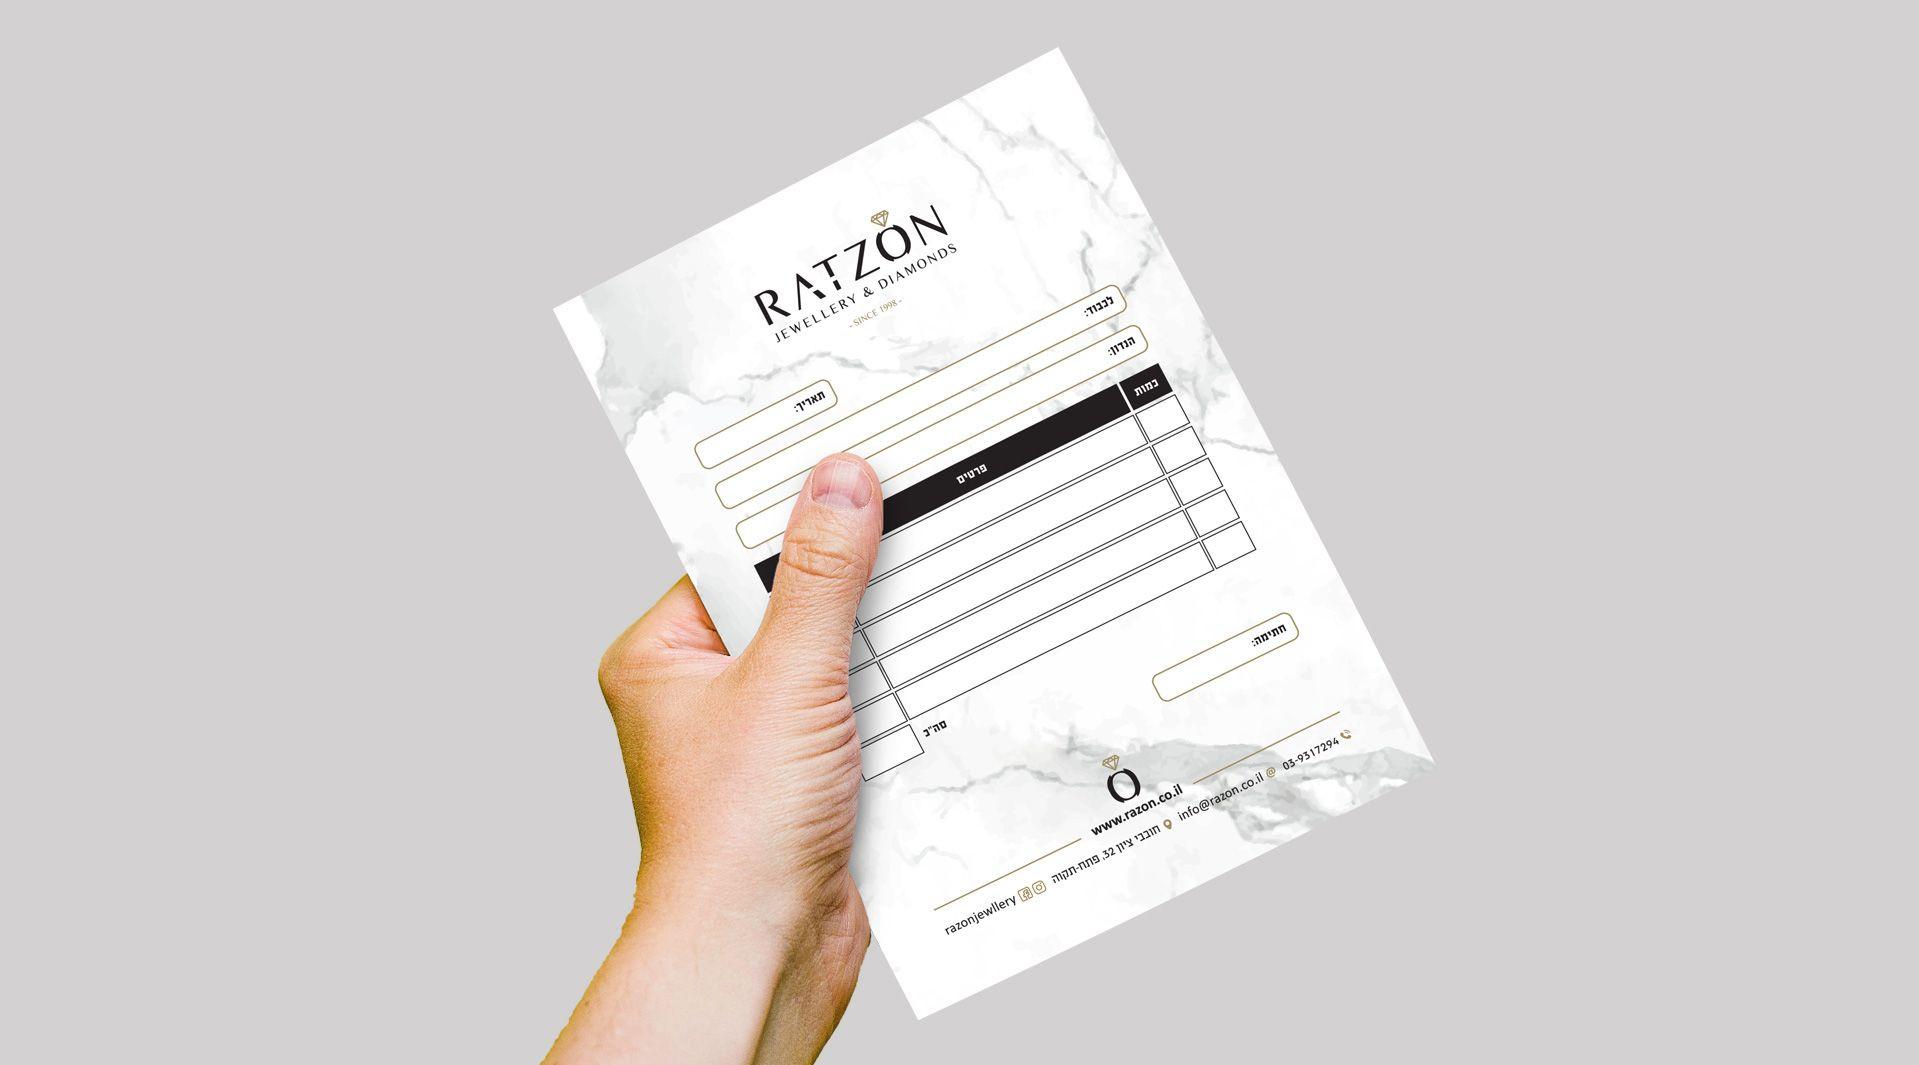 razon_branding4.jpg